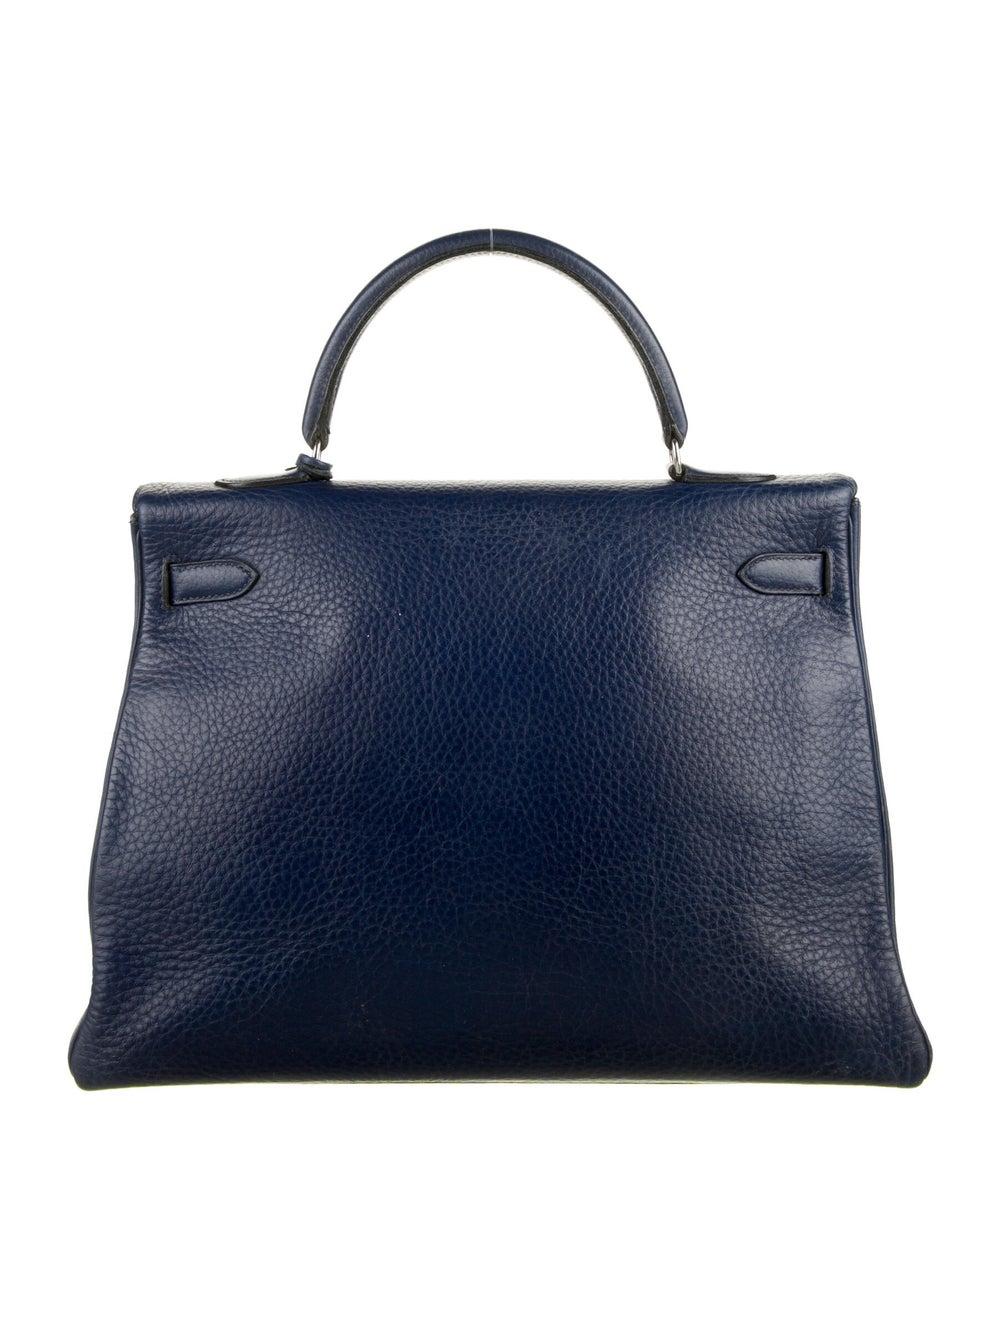 Hermès Vintage Clemence Kelly Retourne 35 Blue - image 4